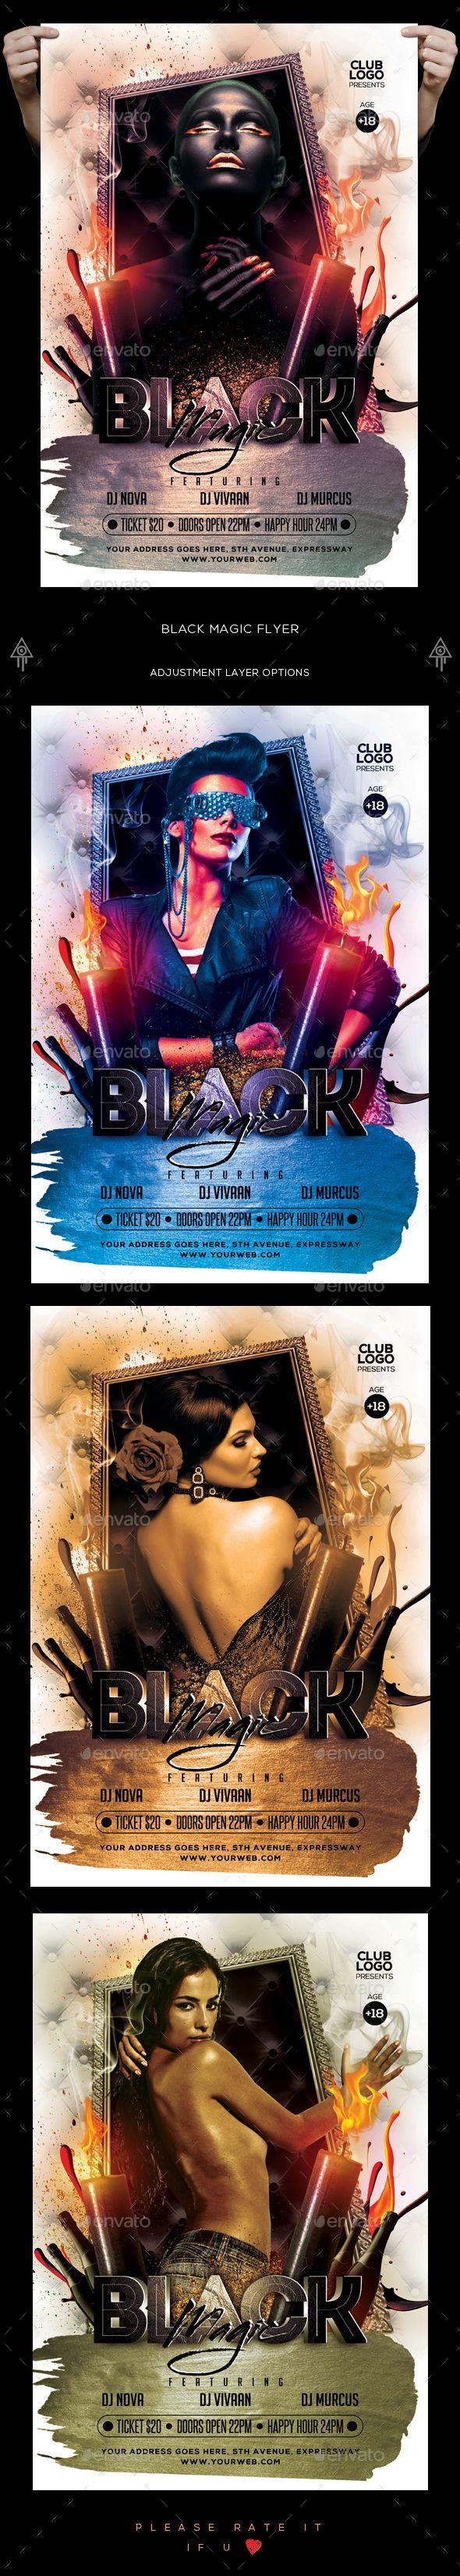 Black Magic Flyer Template PSD